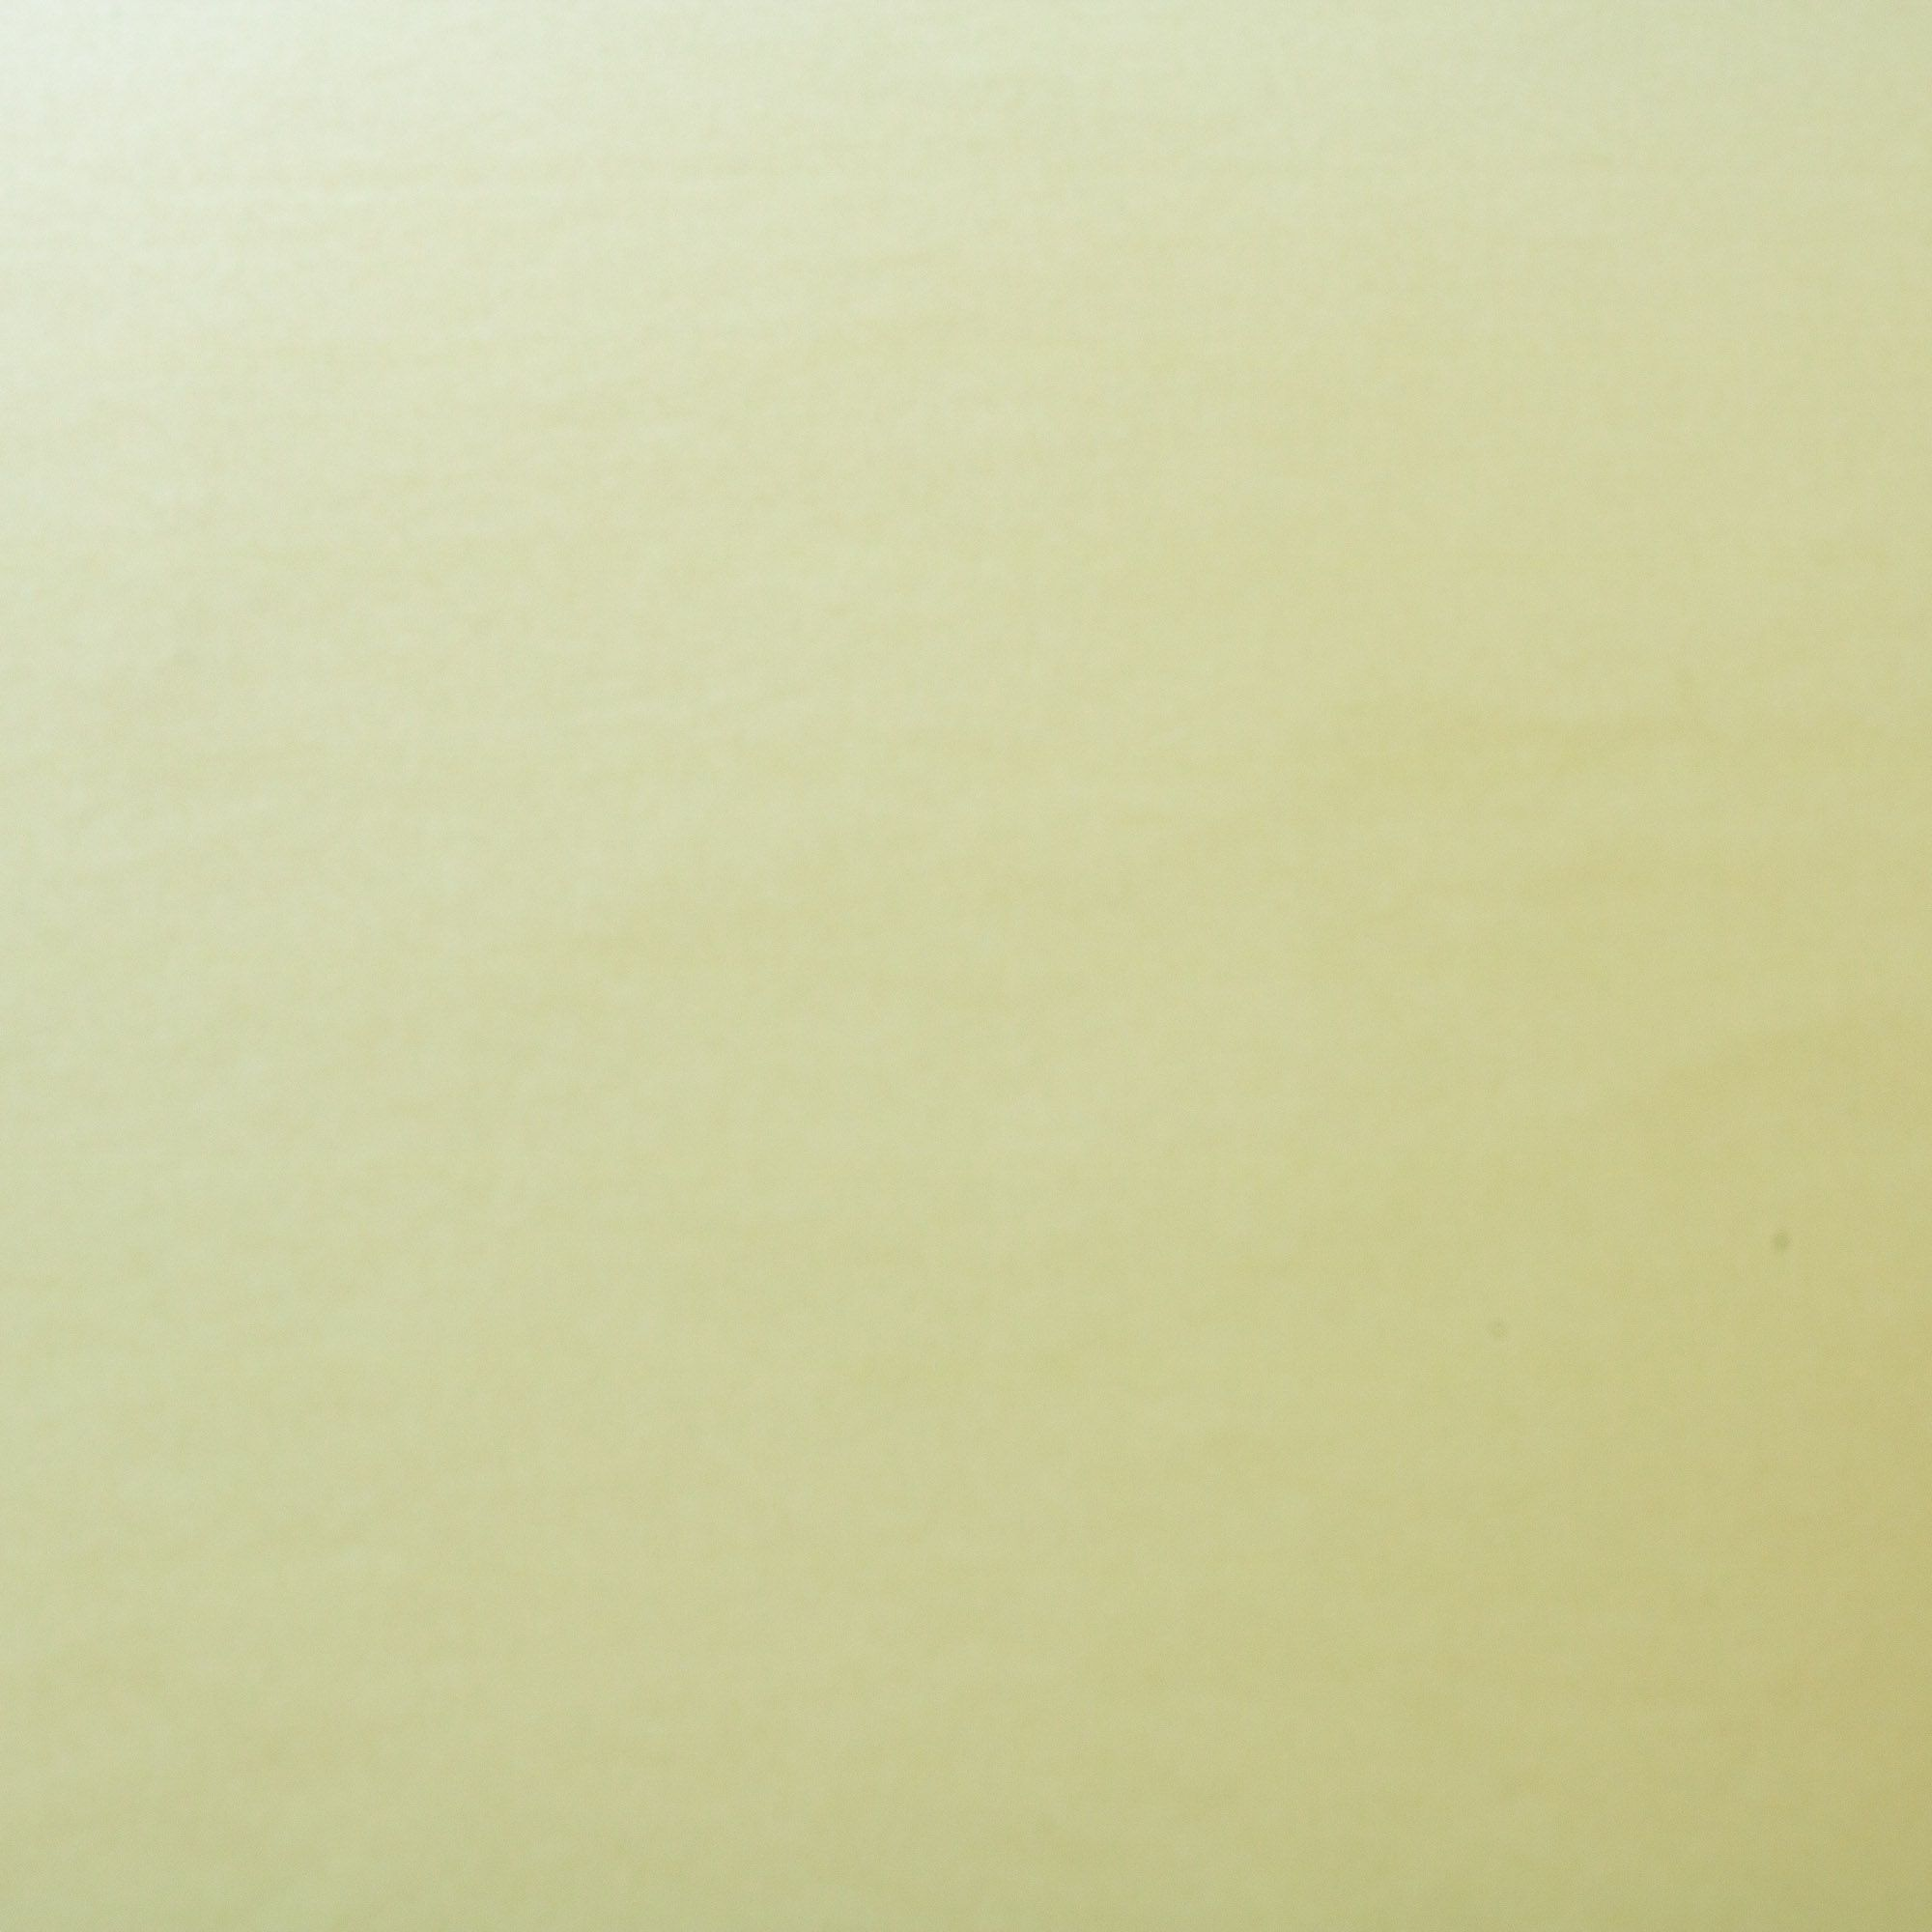 Tecido Malha Helanca Light Verde Claro 100% Poliester 1,80 mt Largura